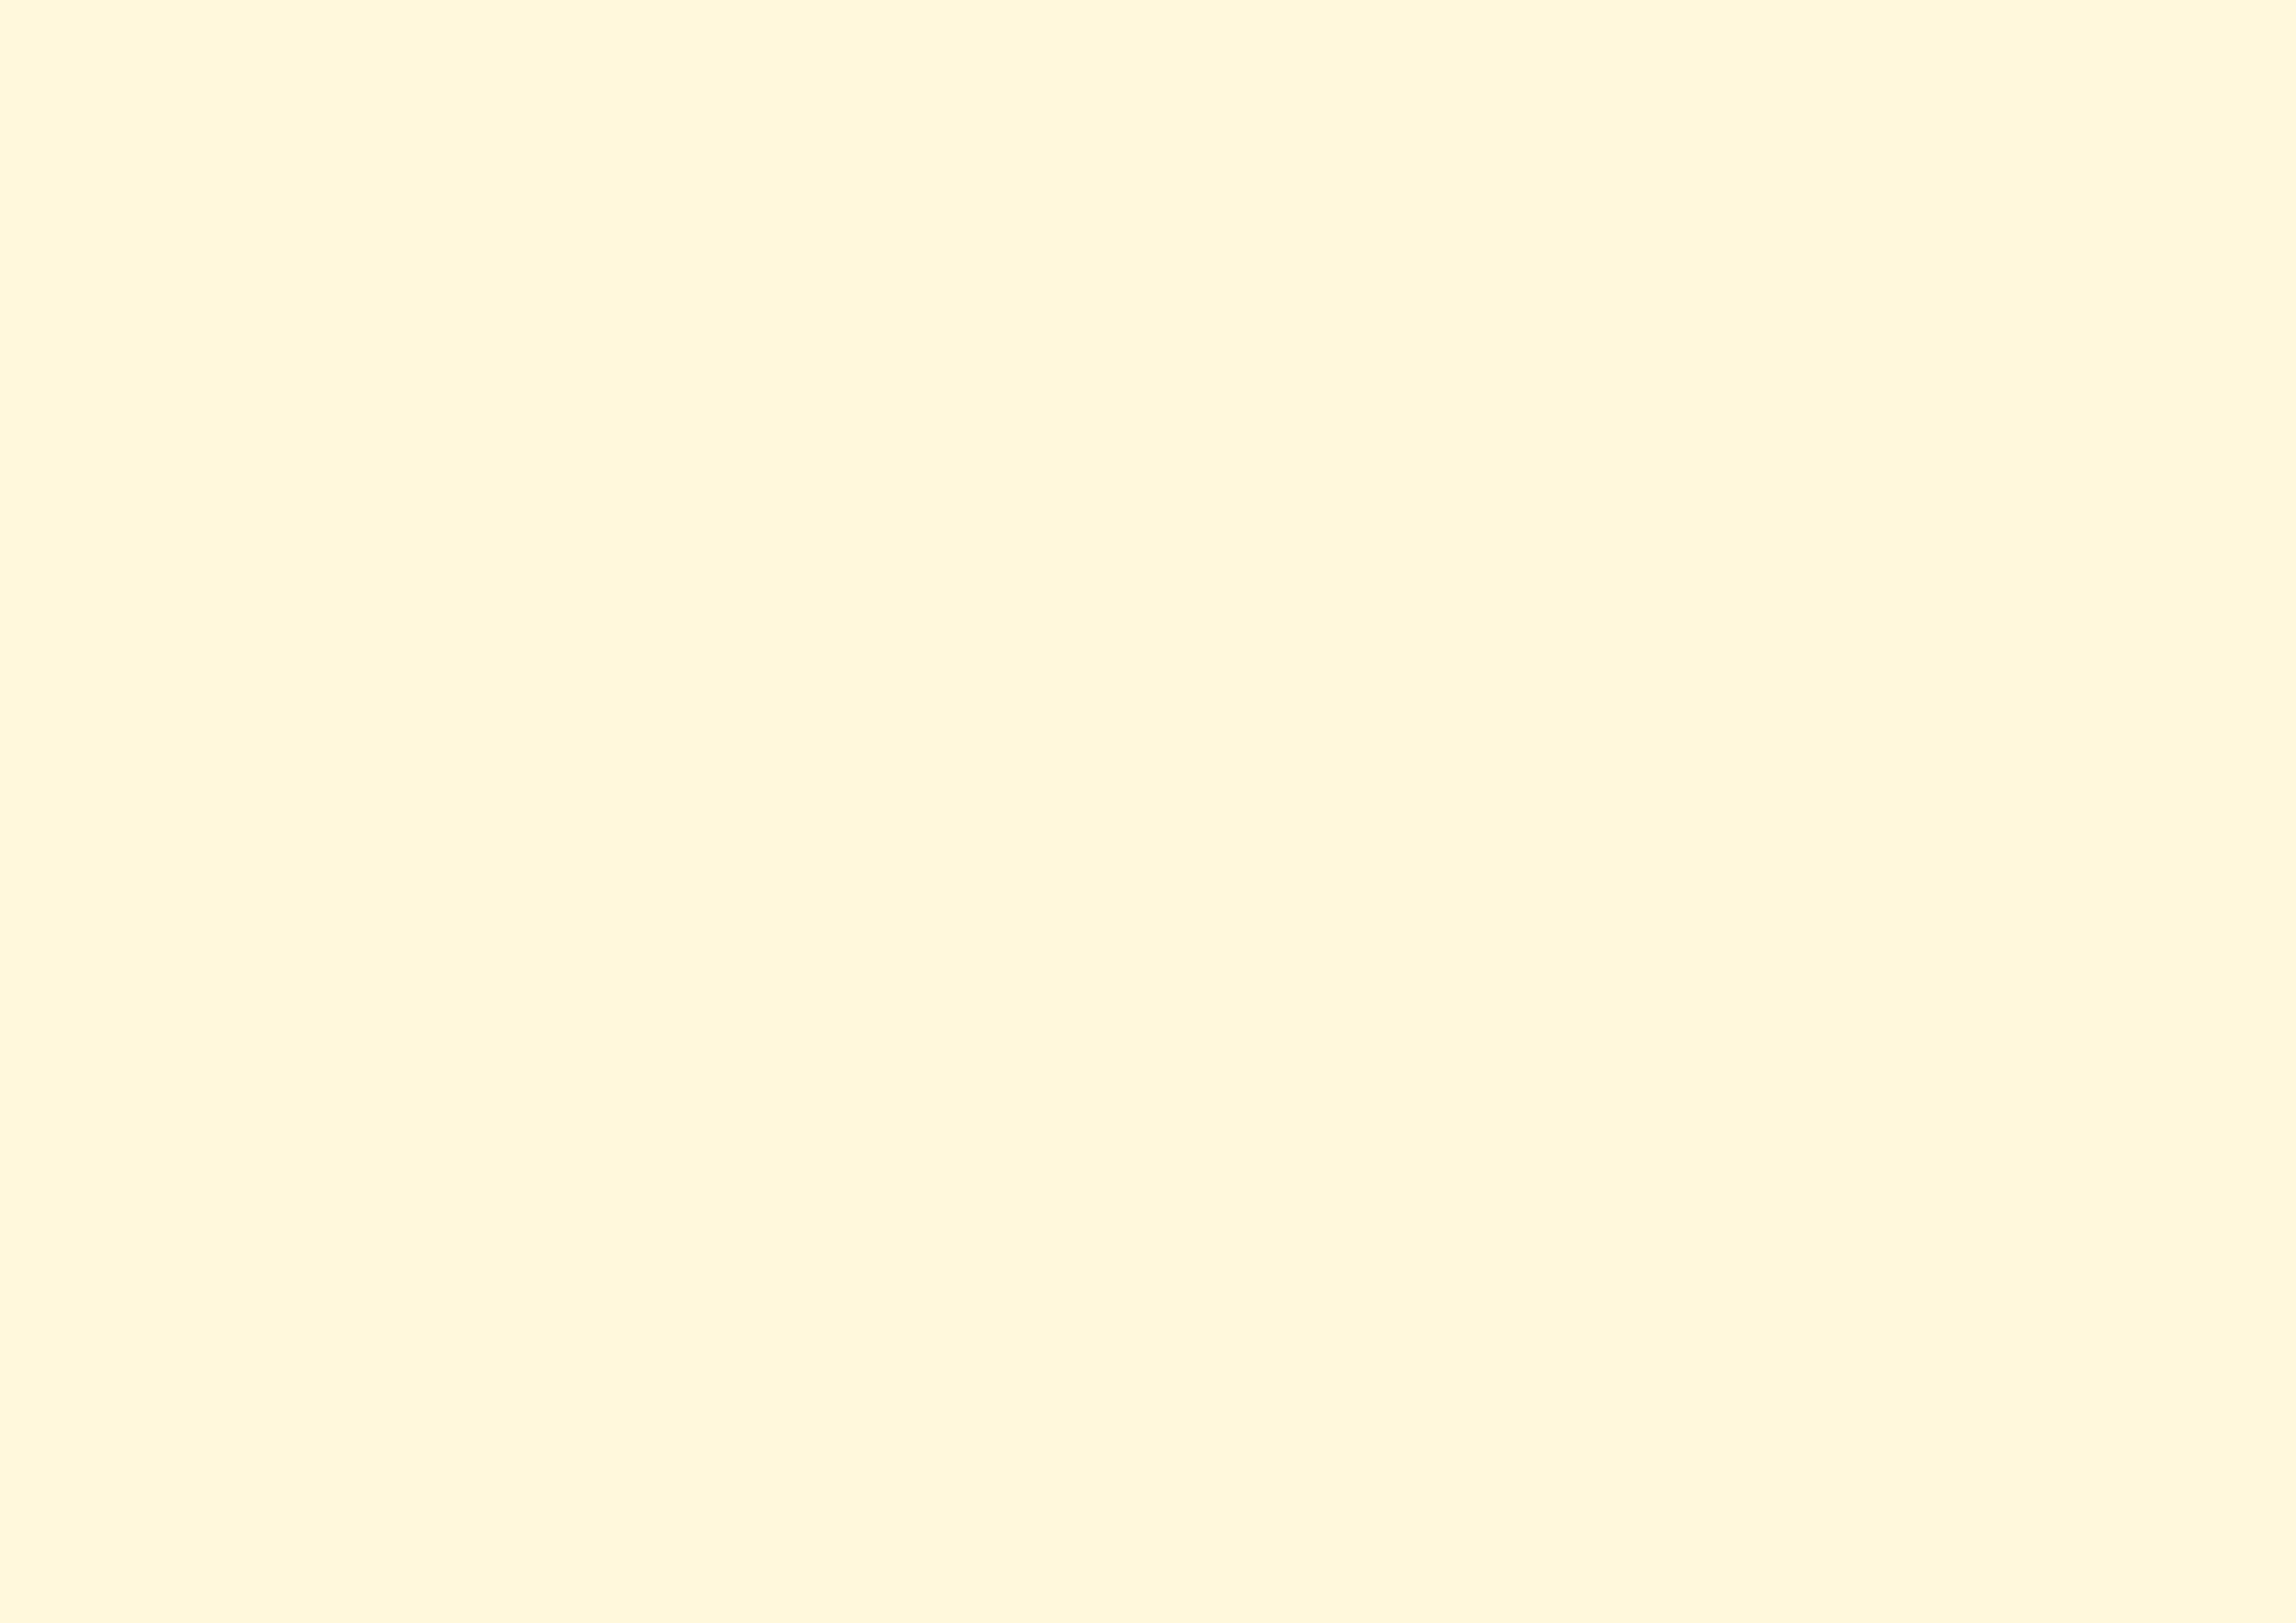 3508x2480 Cornsilk Solid Color Background